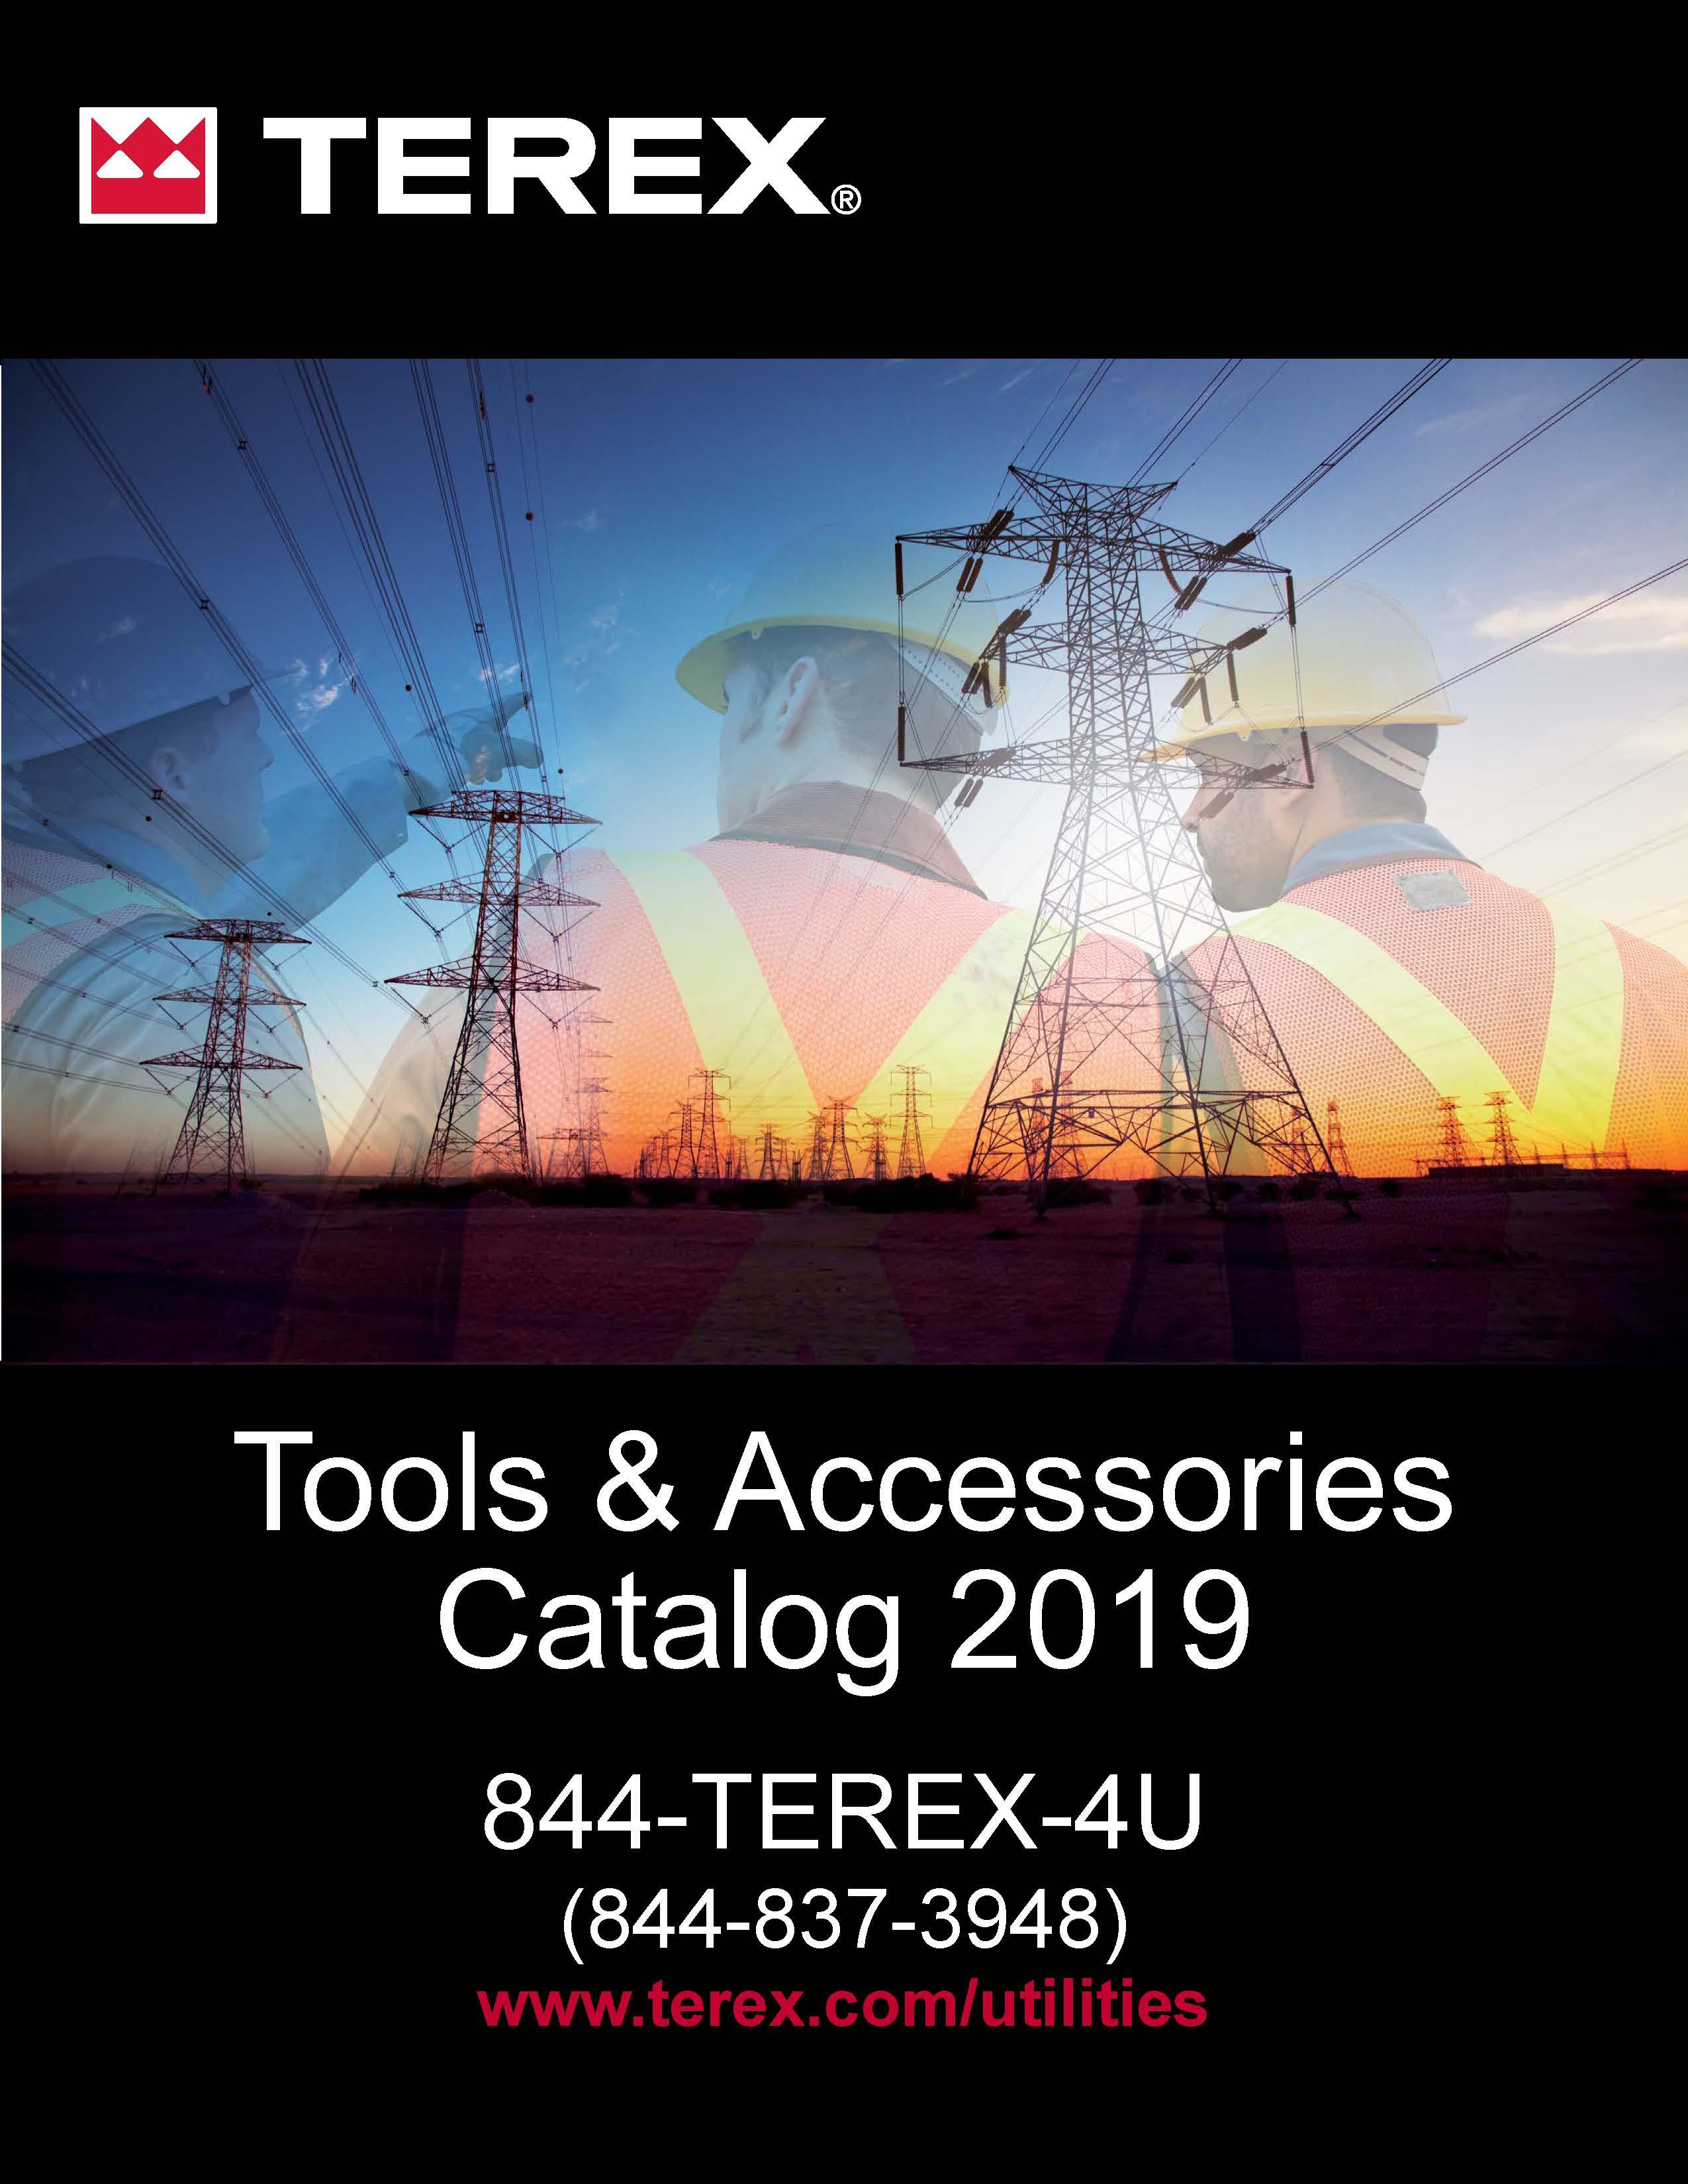 Terex Utilities Tools and Accessories